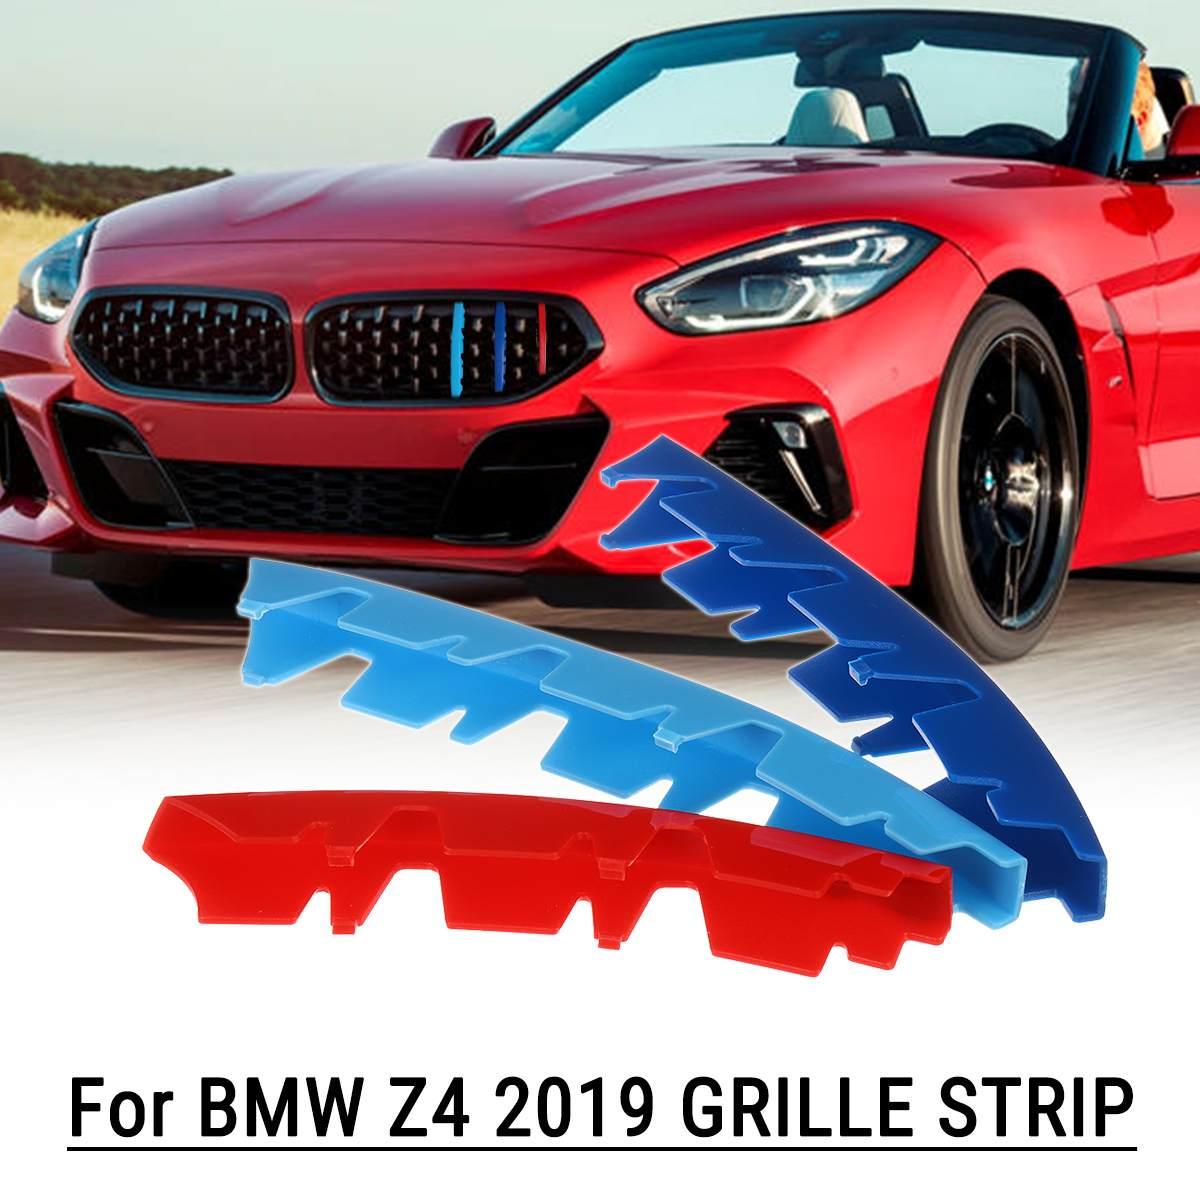 RED TRIM BMW Z4 2 Clip E85 Tailored Car Mats